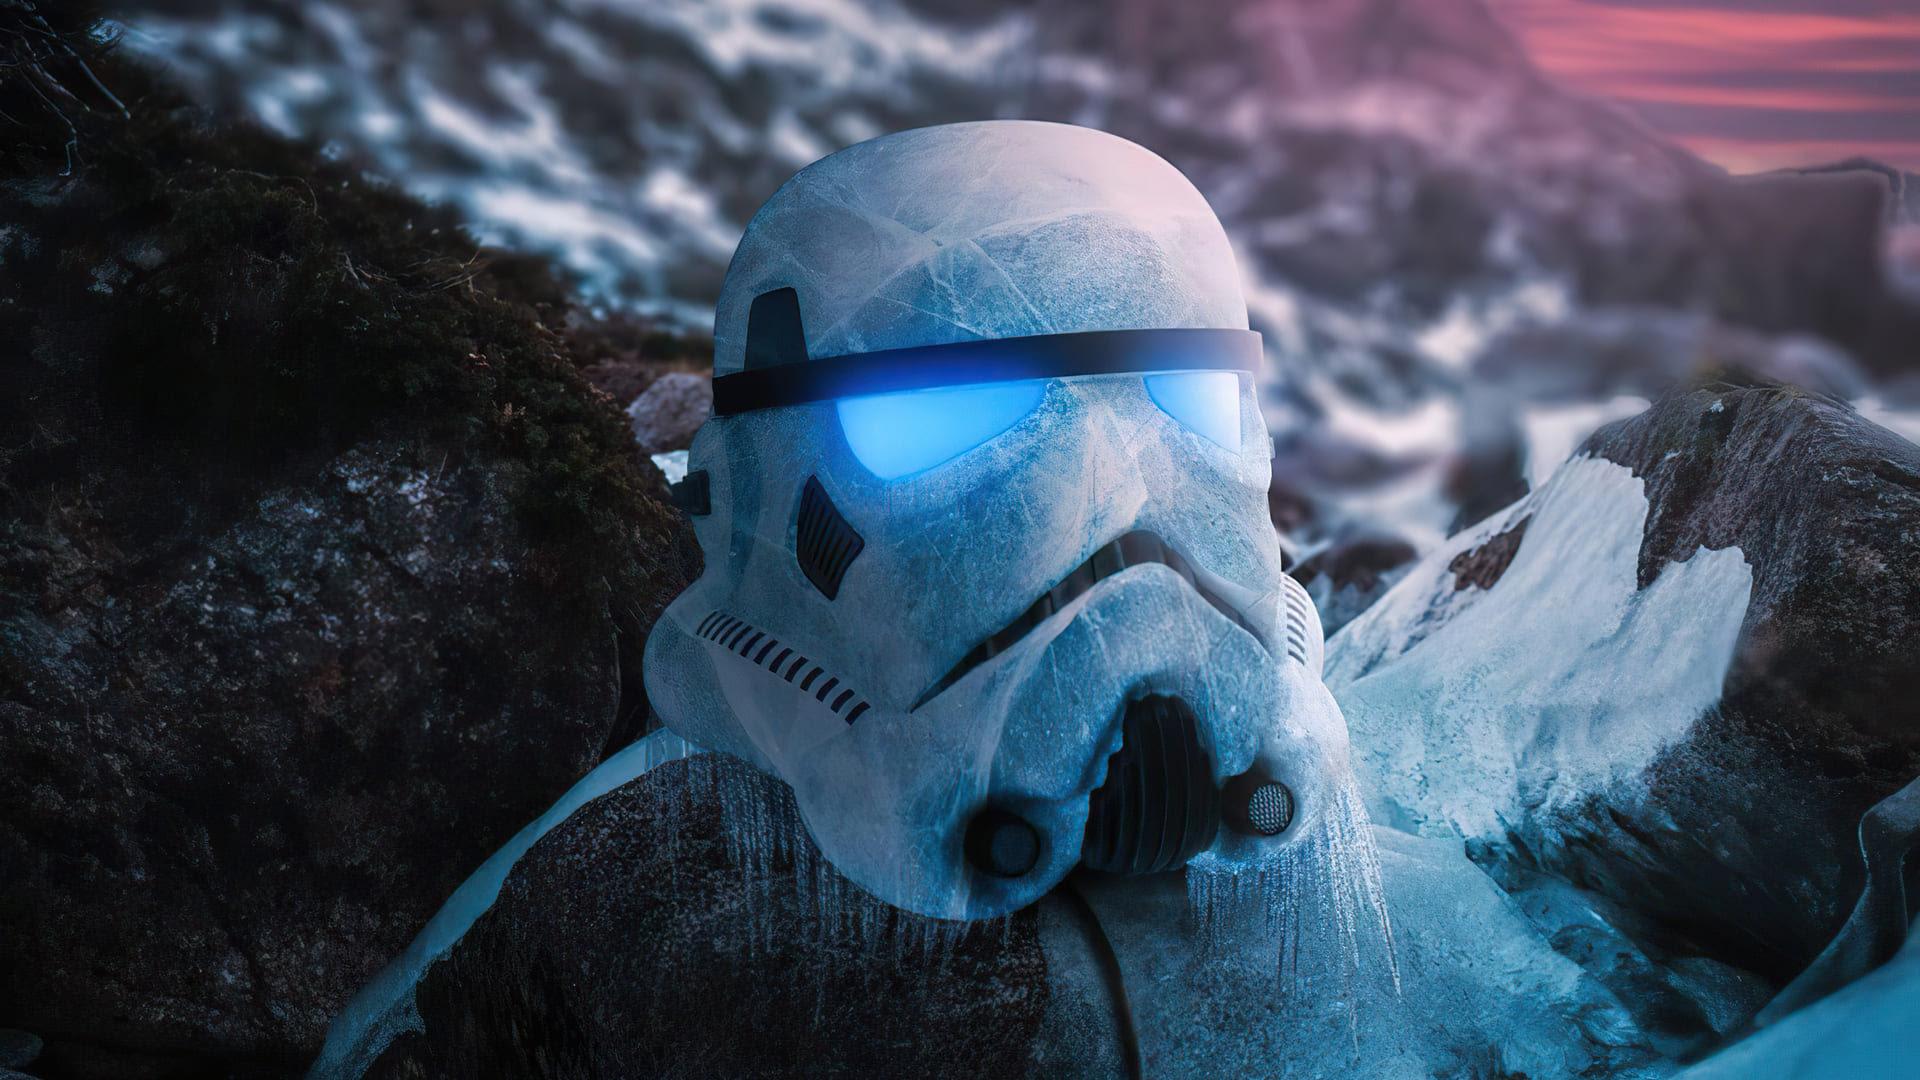 Star Wars Hd Wallpapers Top Best Ultra Hd Star Wars Backgrounds